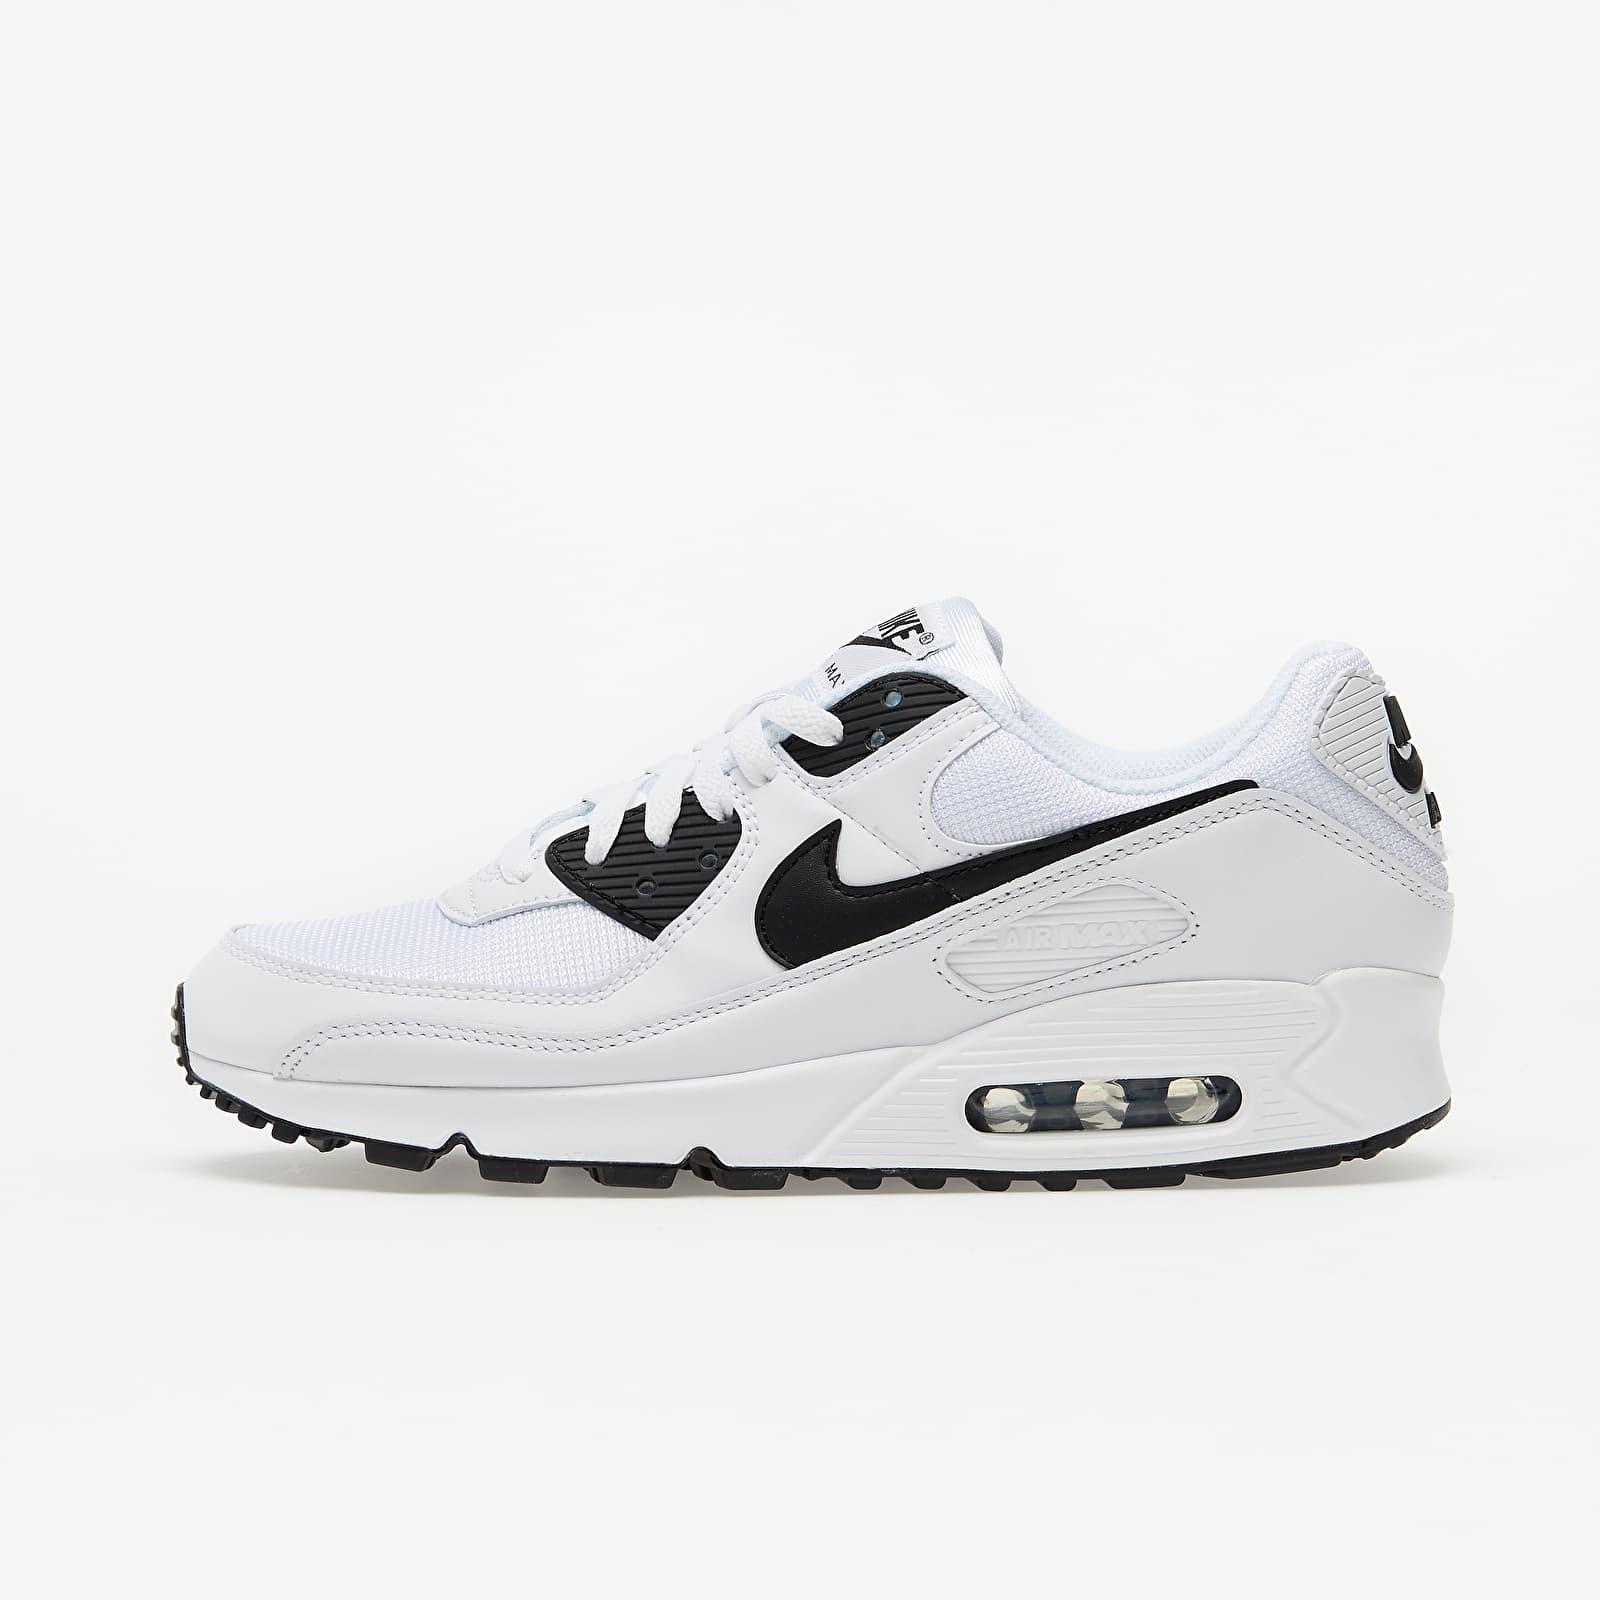 Nike Air Max 90 White/ Black-White | Footshop